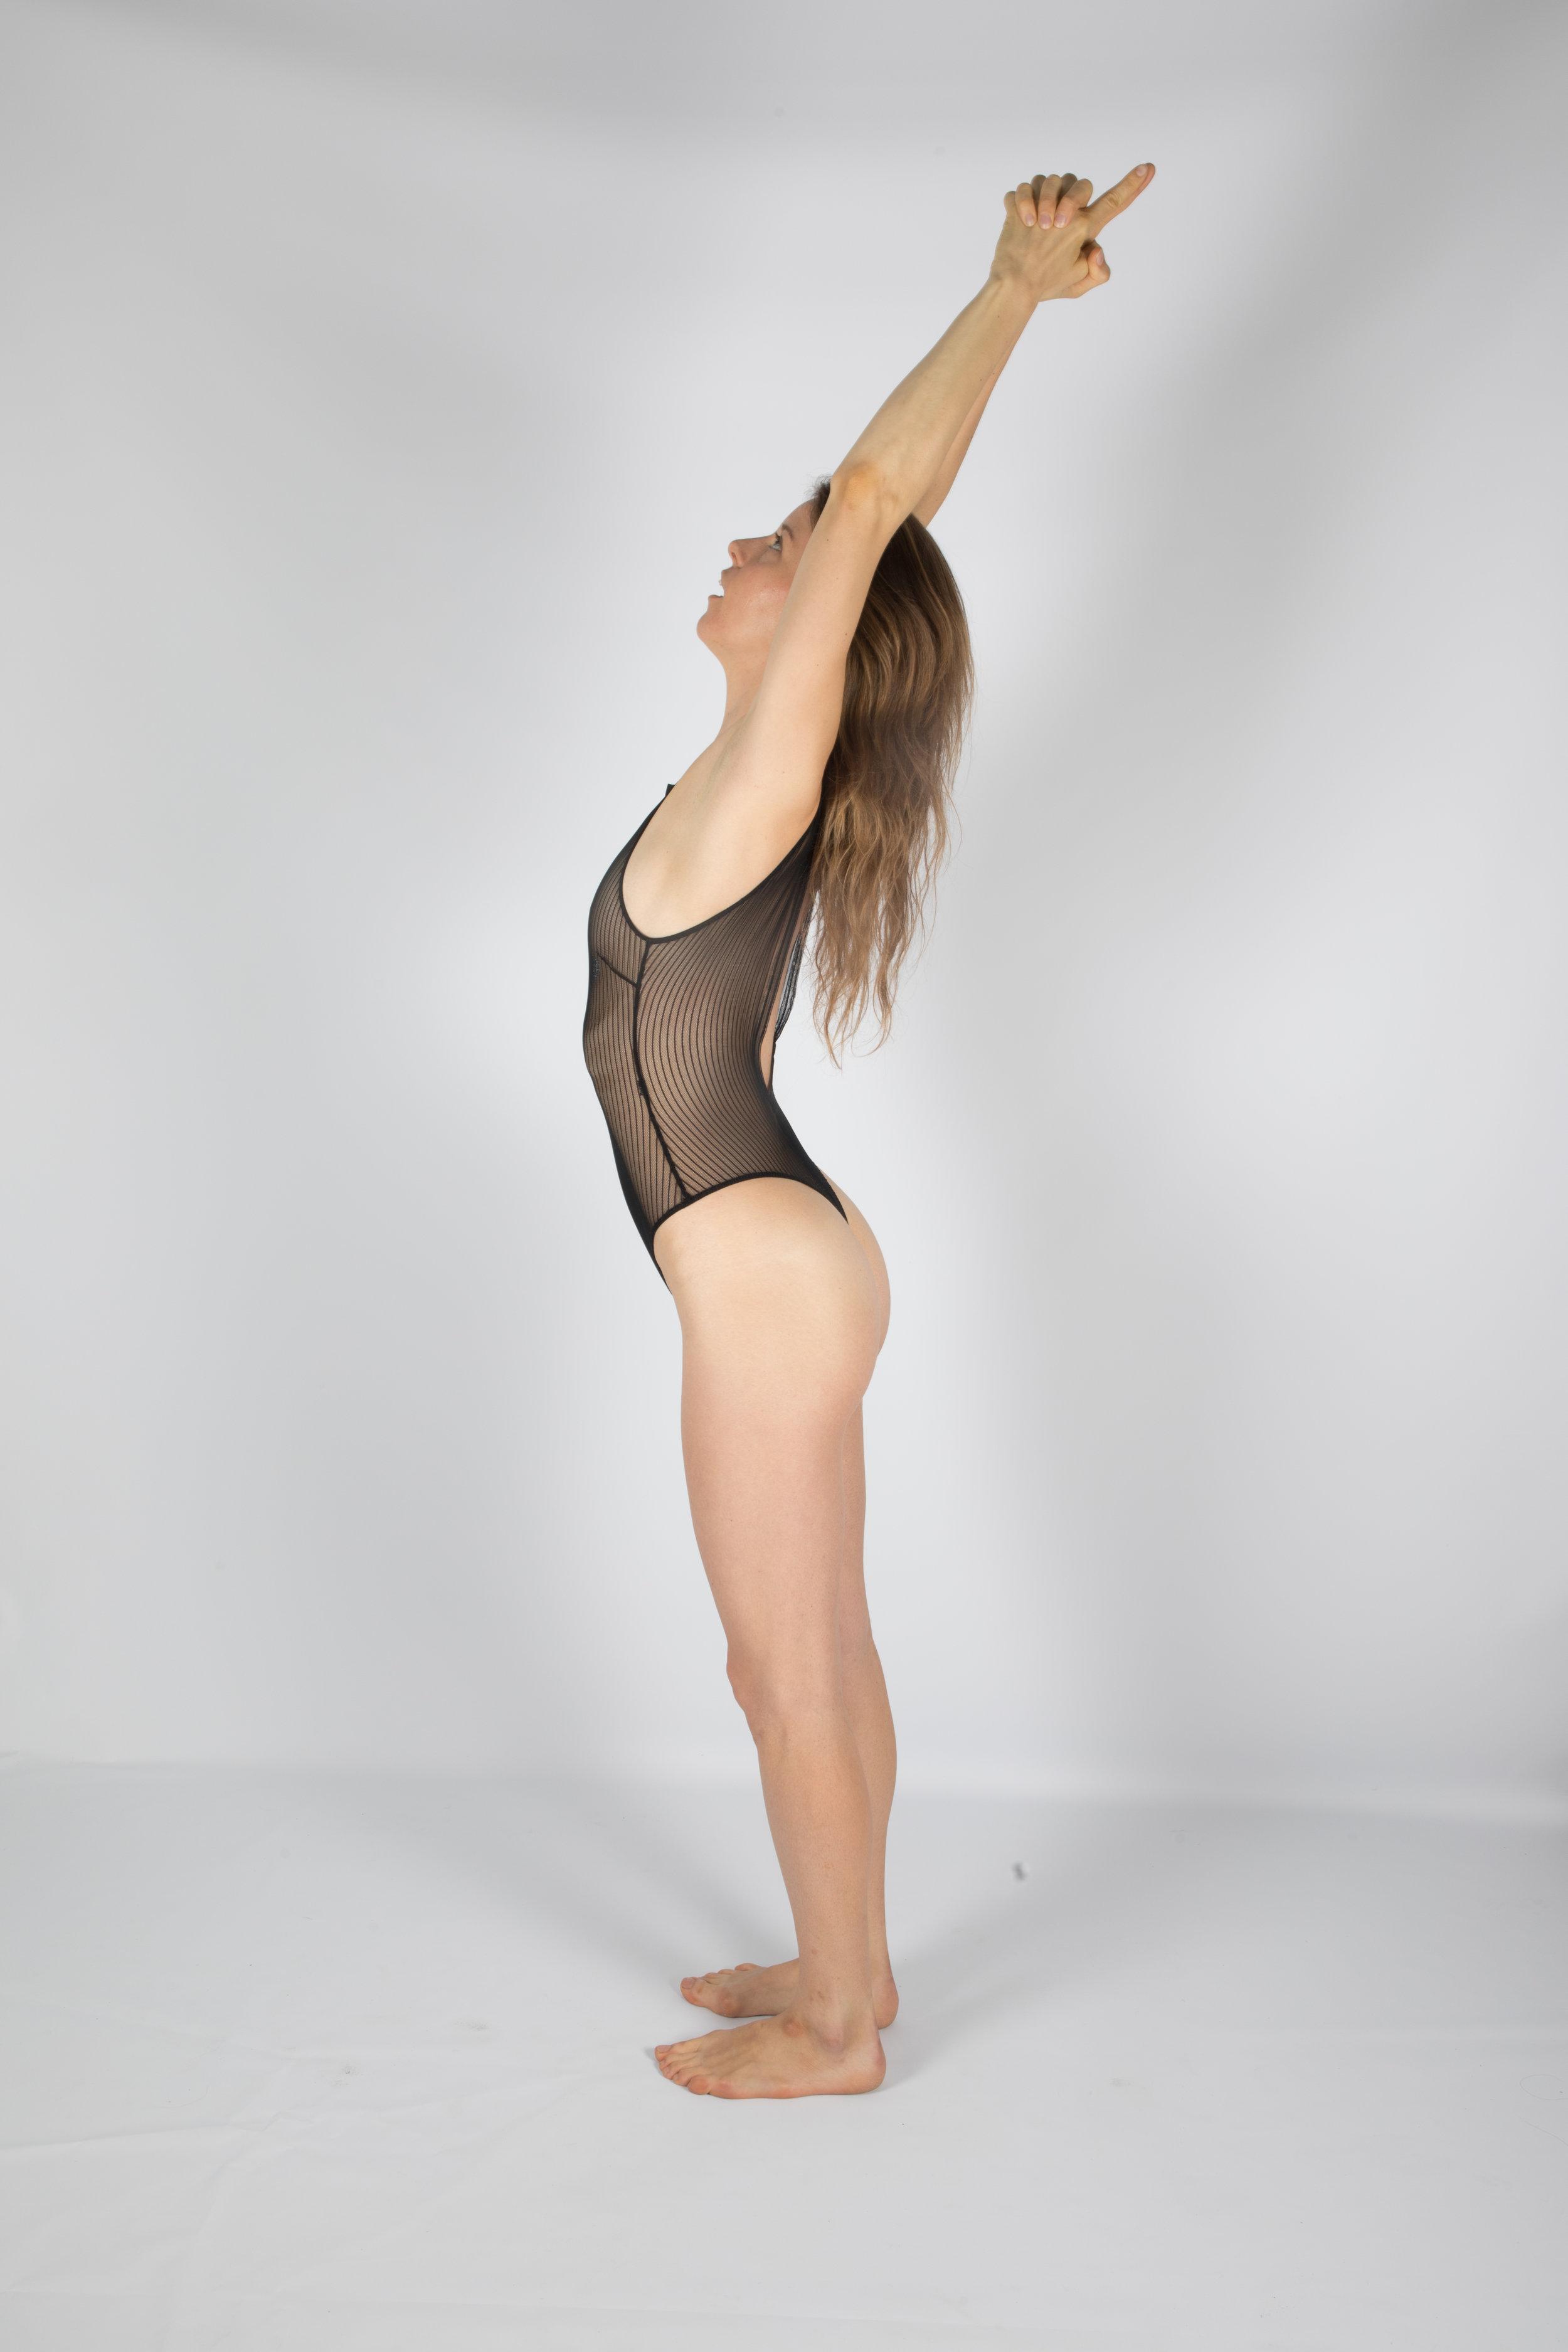 Kat Yoga-6954.jpg